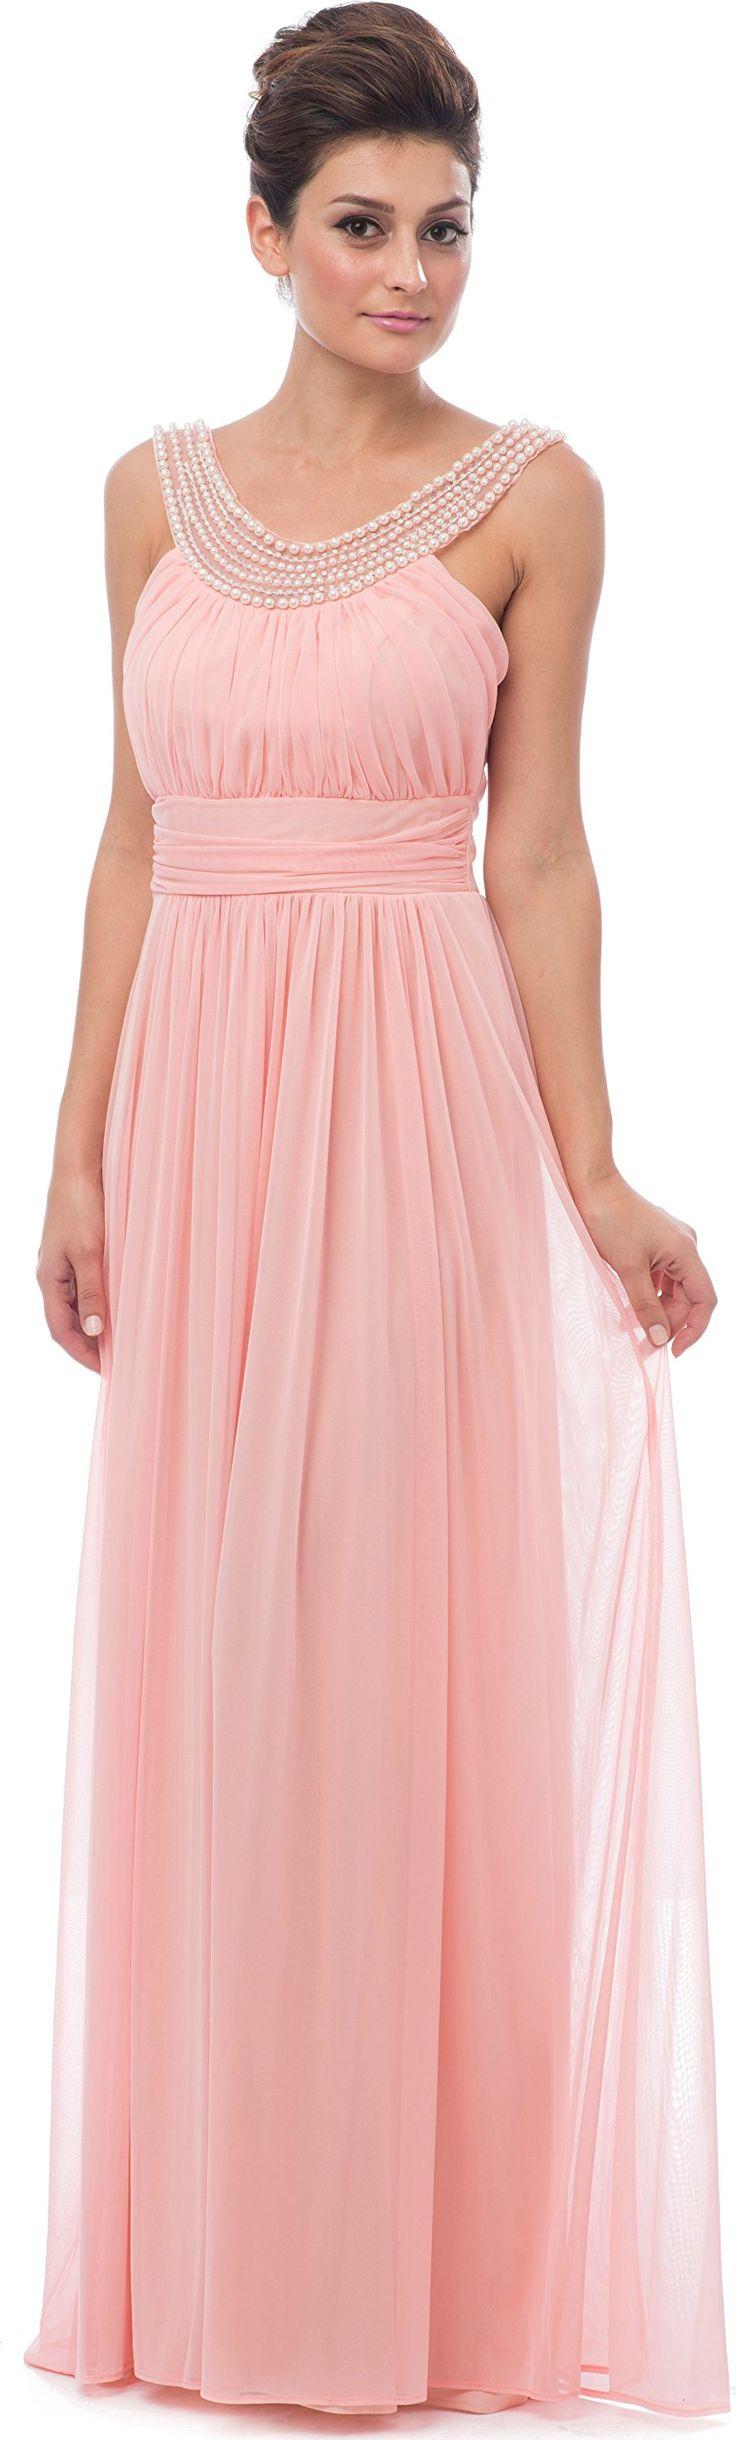 Fantástico Vestidos De Novia Princesa Tumblr Patrón - Ideas de ...